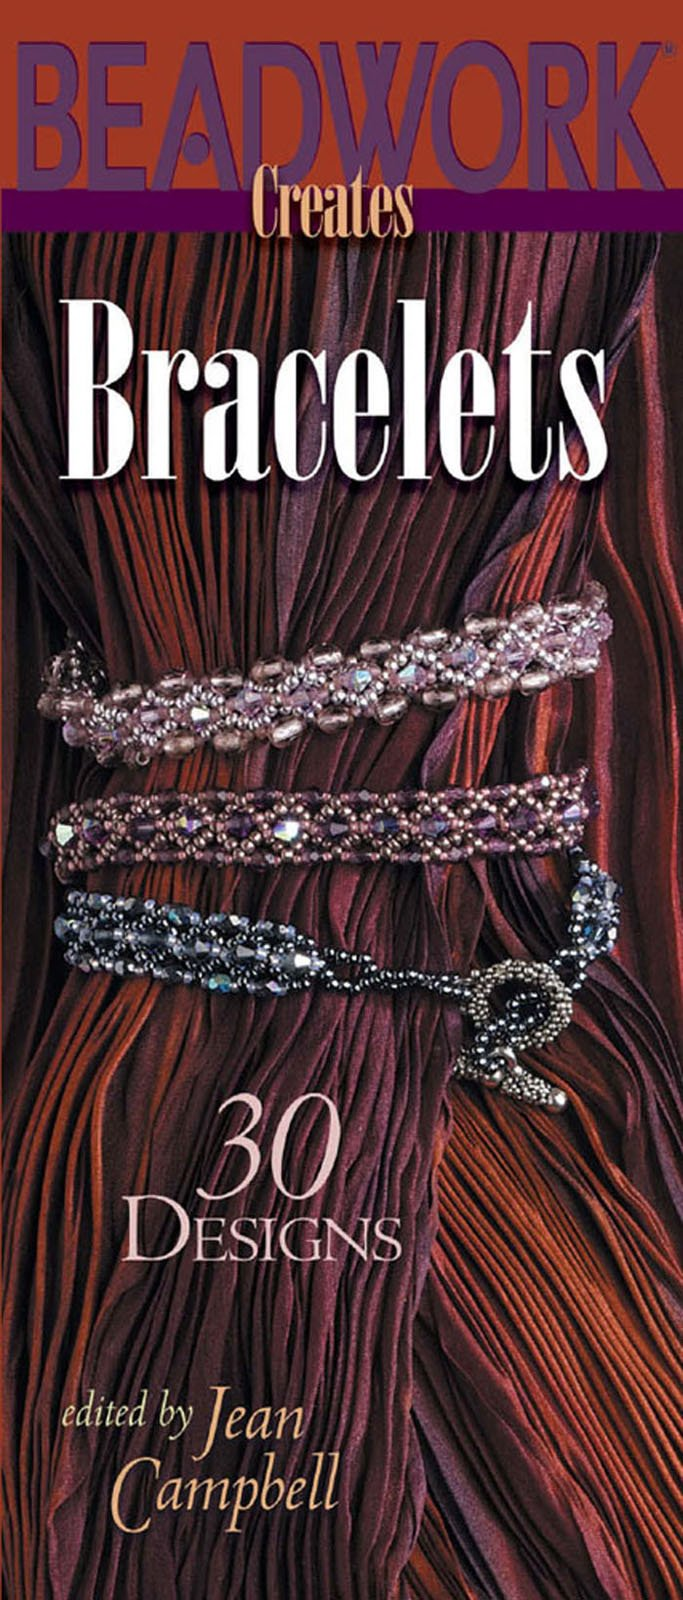 Download Beadwork Creates Bracelets pdf epub